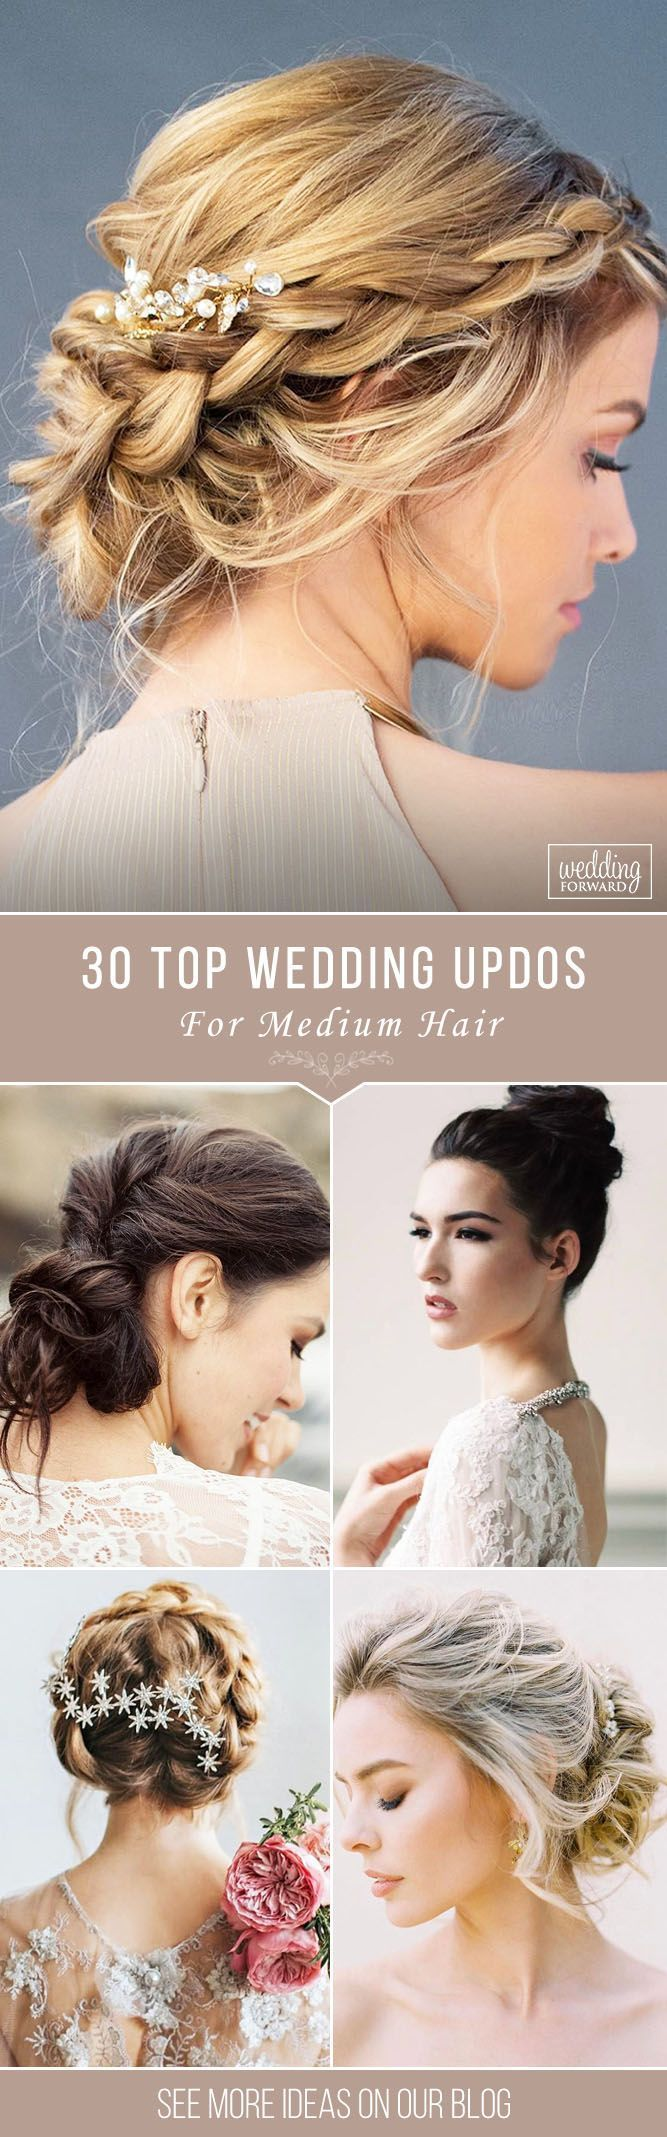 30 Top Wedding Updos For Medium Hair ❤️ Wedding updos for medium hair will b...